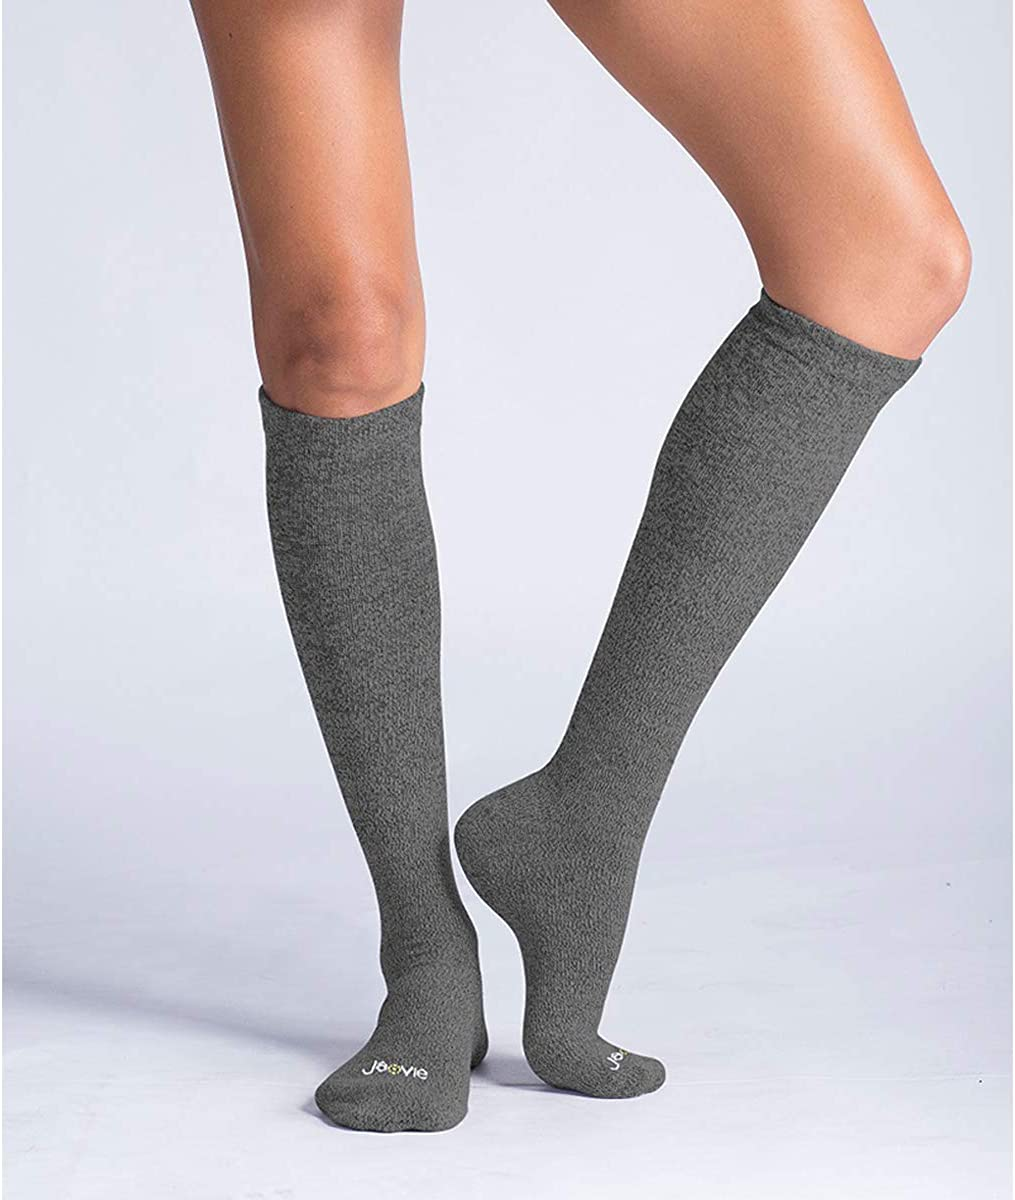 JAVIE 80/% Merino Wool Ultra Soft 15-20mmHg Graduated Compression Socks for Women /& Men